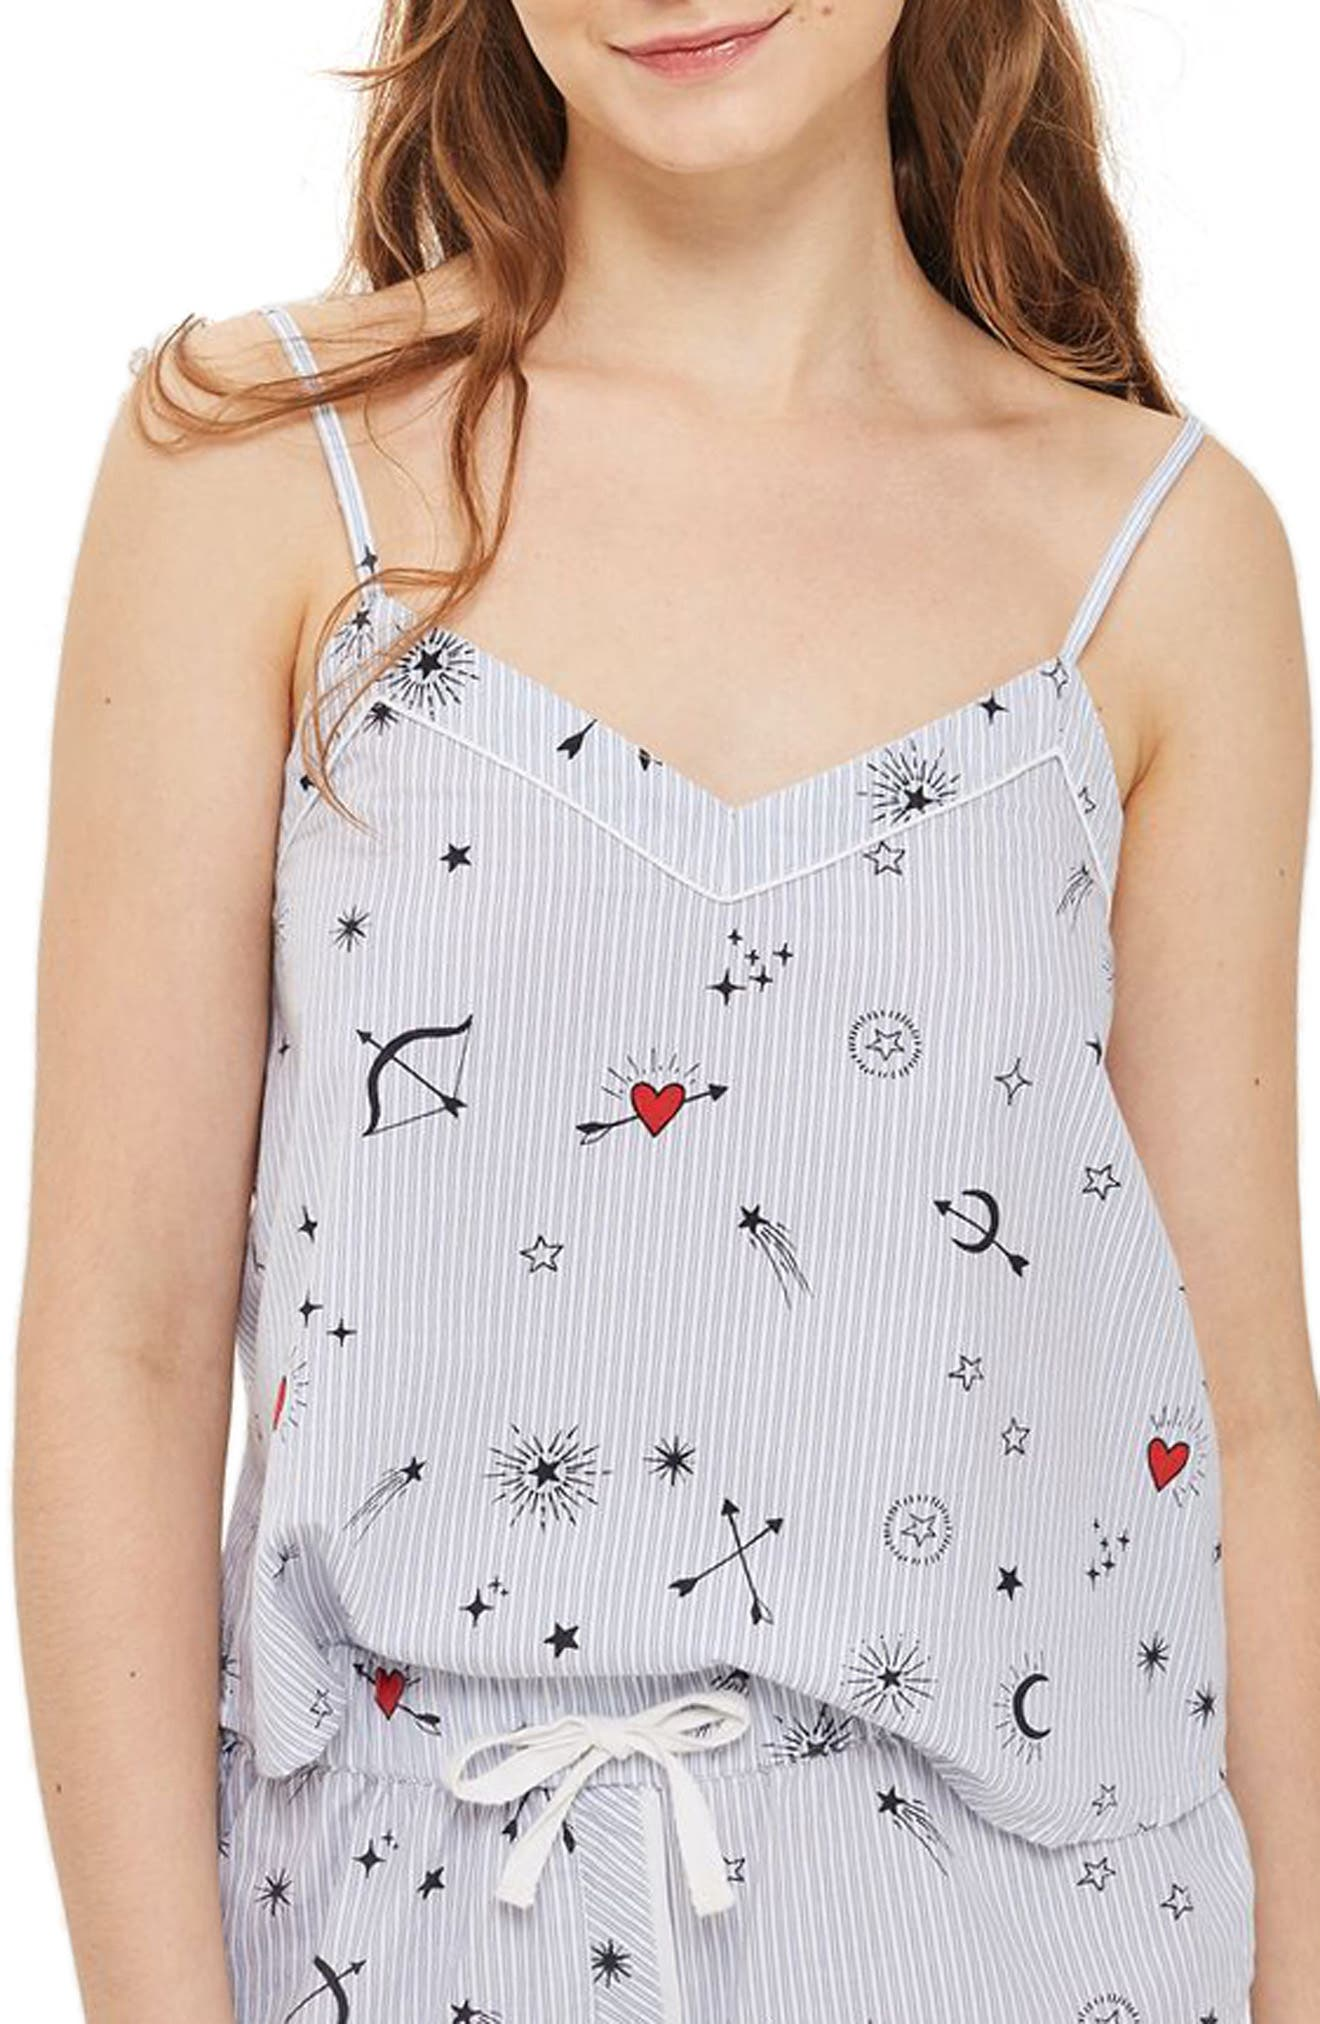 Topshop Heart Print Stripe Camisole Top